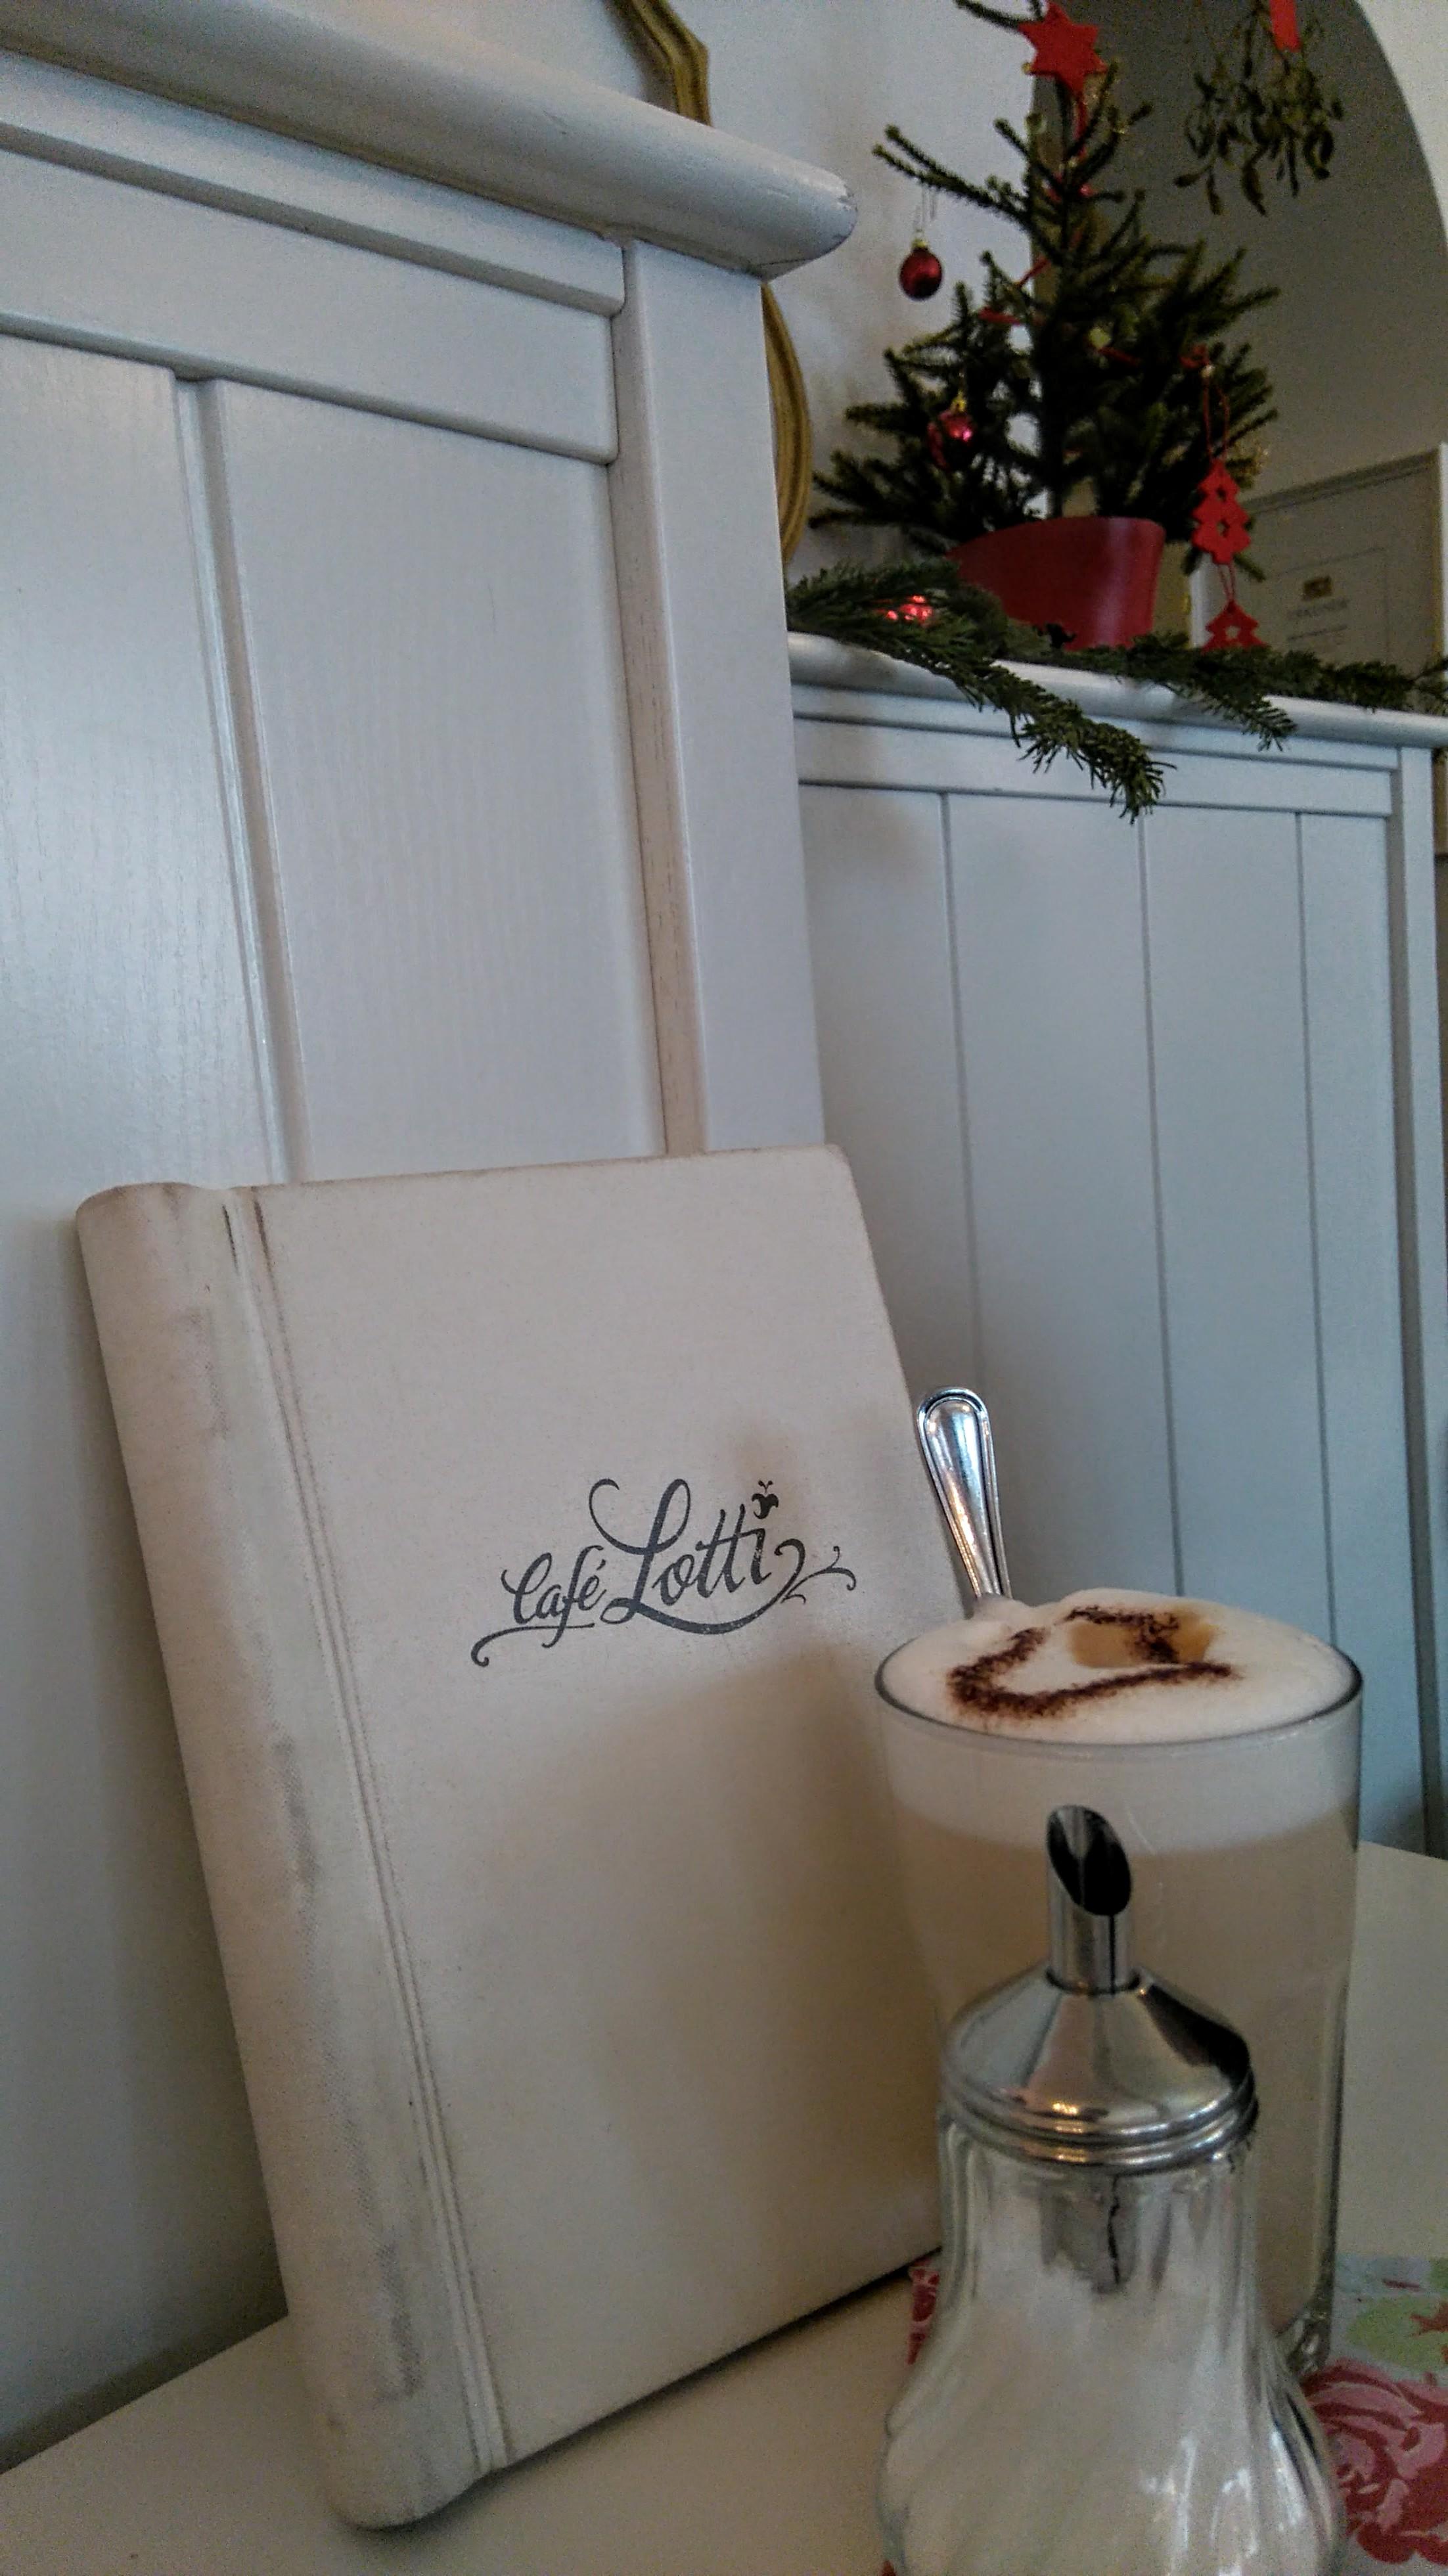 cafe lotti true life odyssey. Black Bedroom Furniture Sets. Home Design Ideas